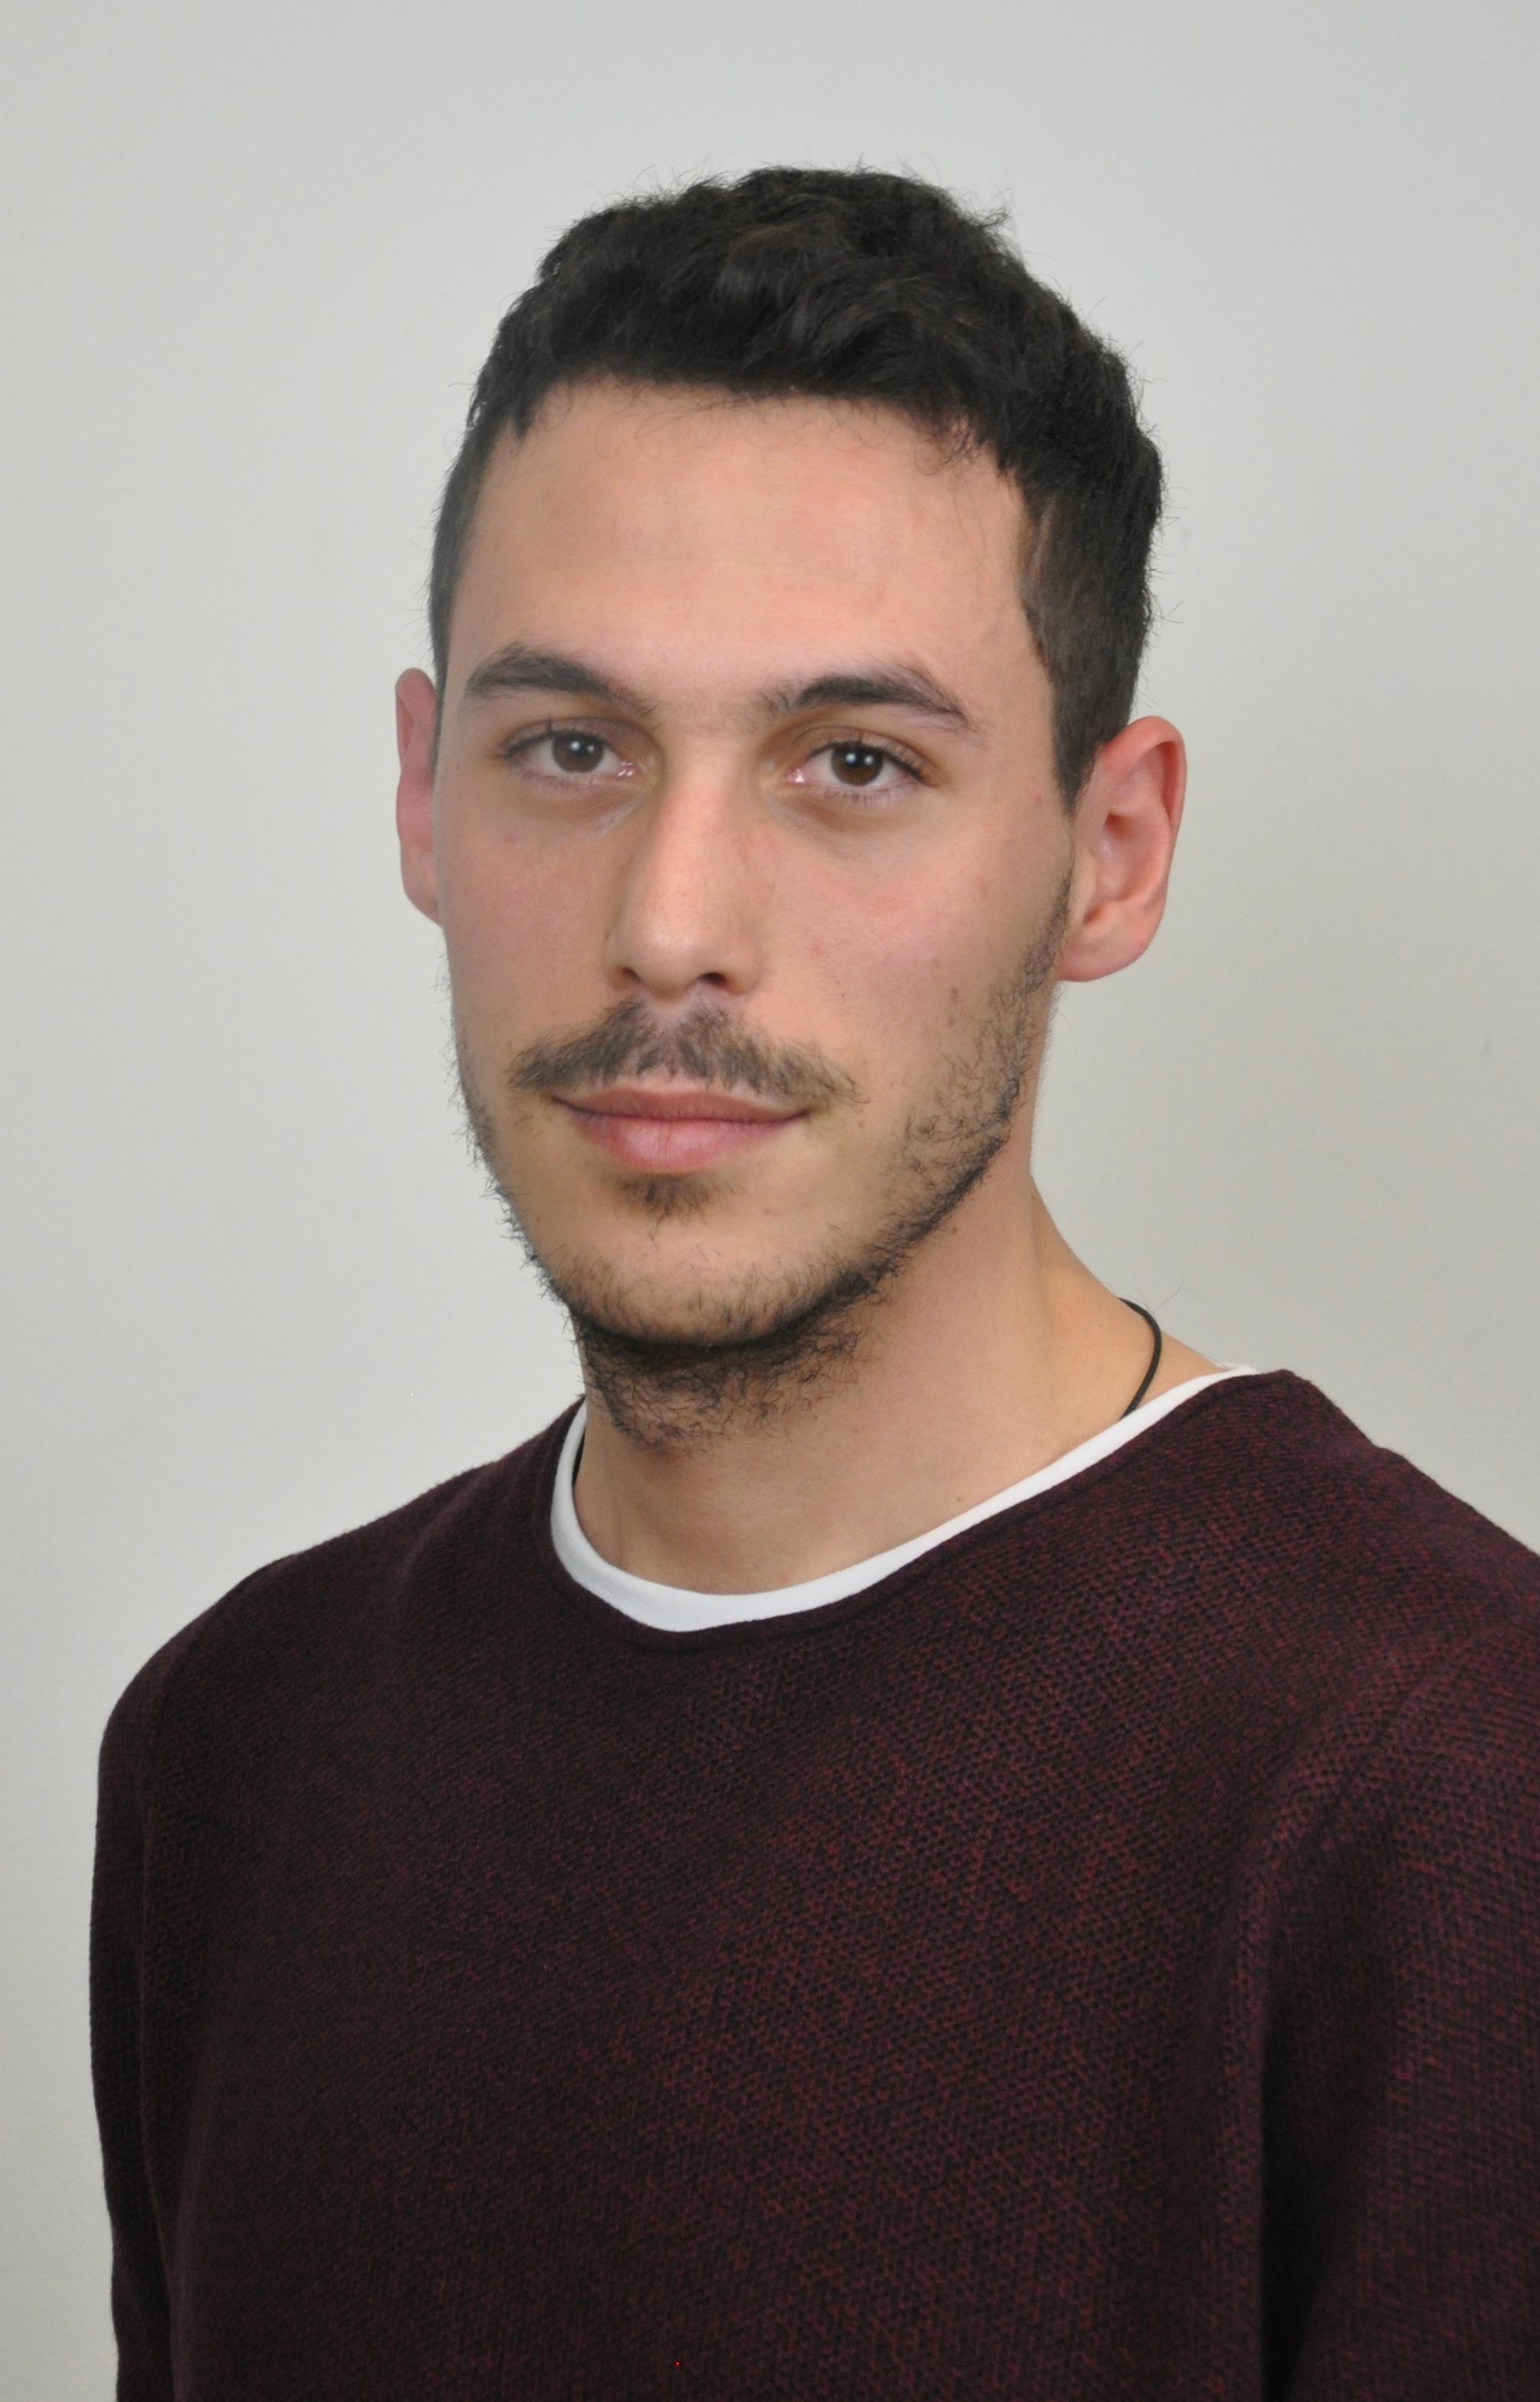 Yiannis Zaheilas